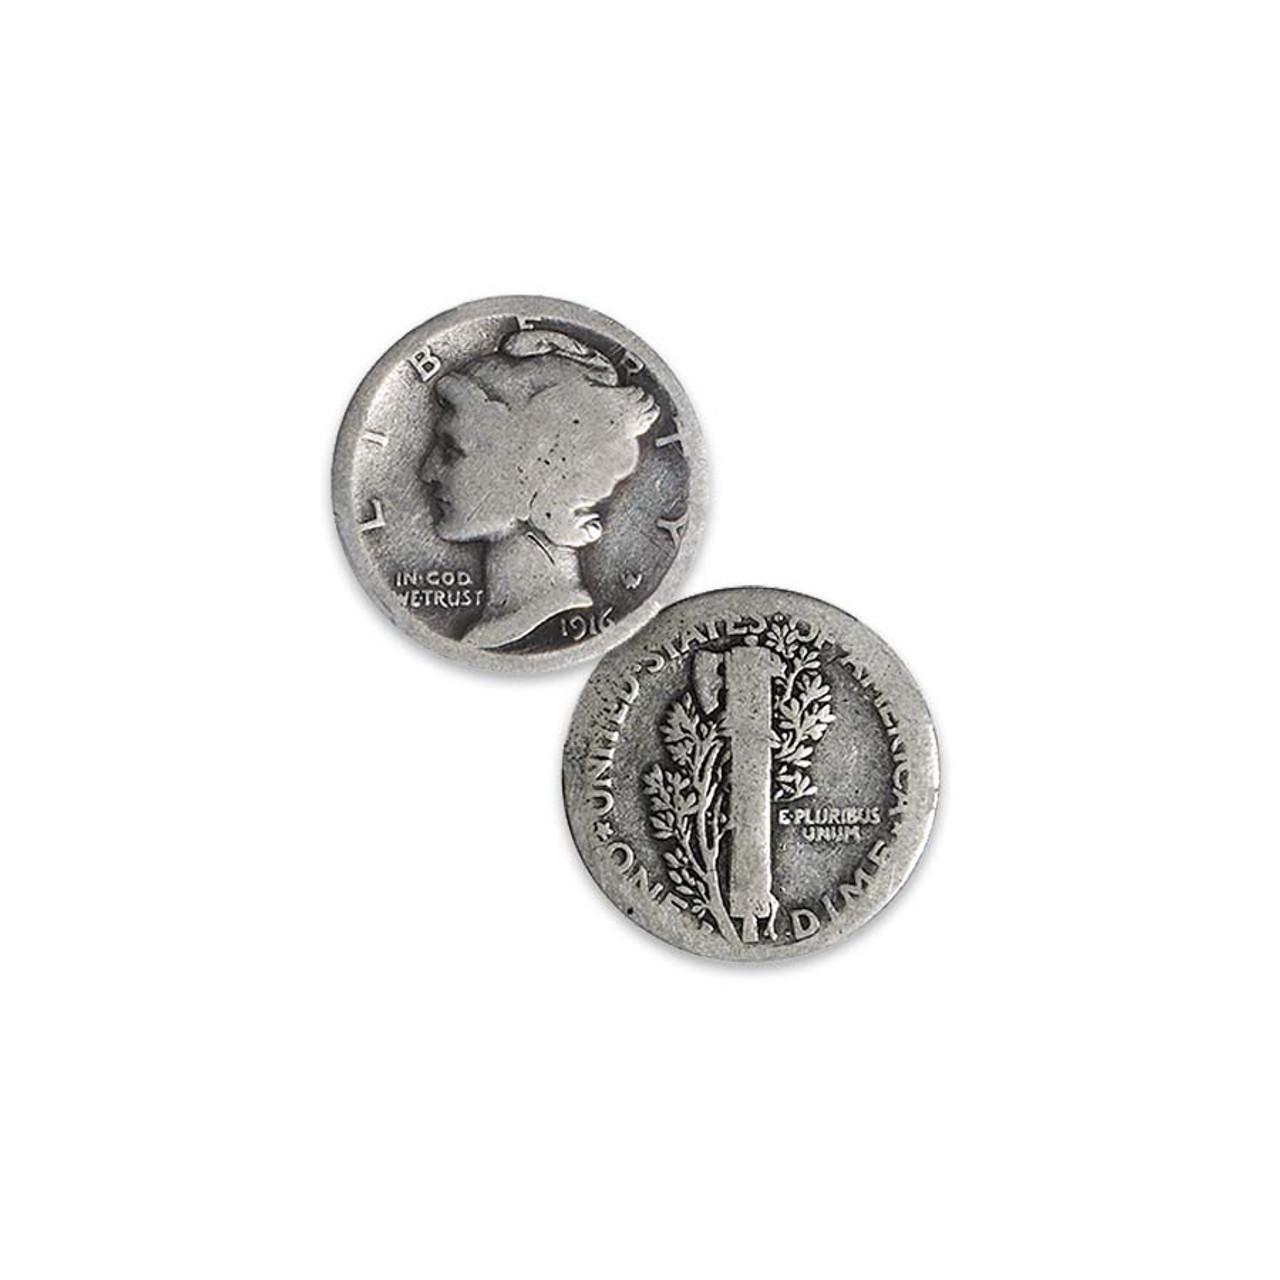 1916-D Mercury Silver Dime About Good